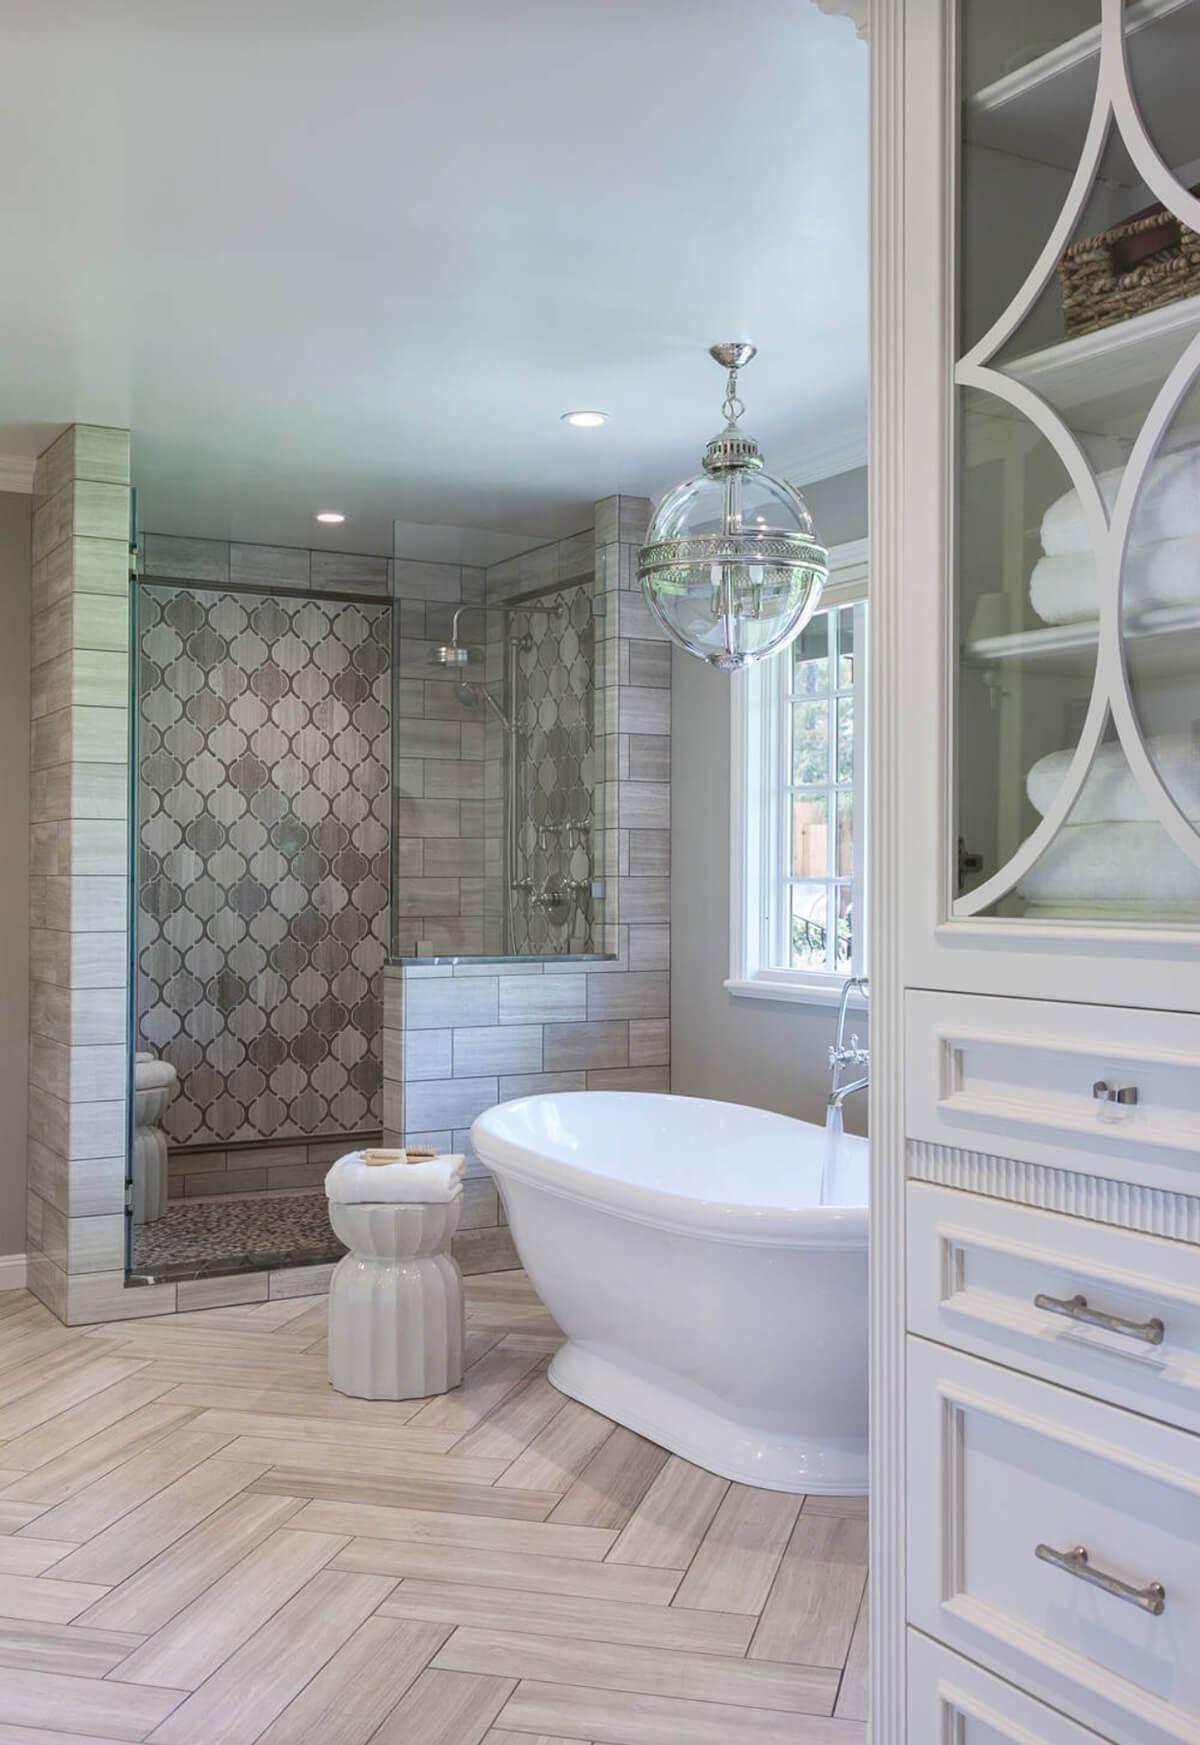 32 Best Master Bathroom Ideas and Designs for 2020 on Popular Bathroom Ideas  id=21642